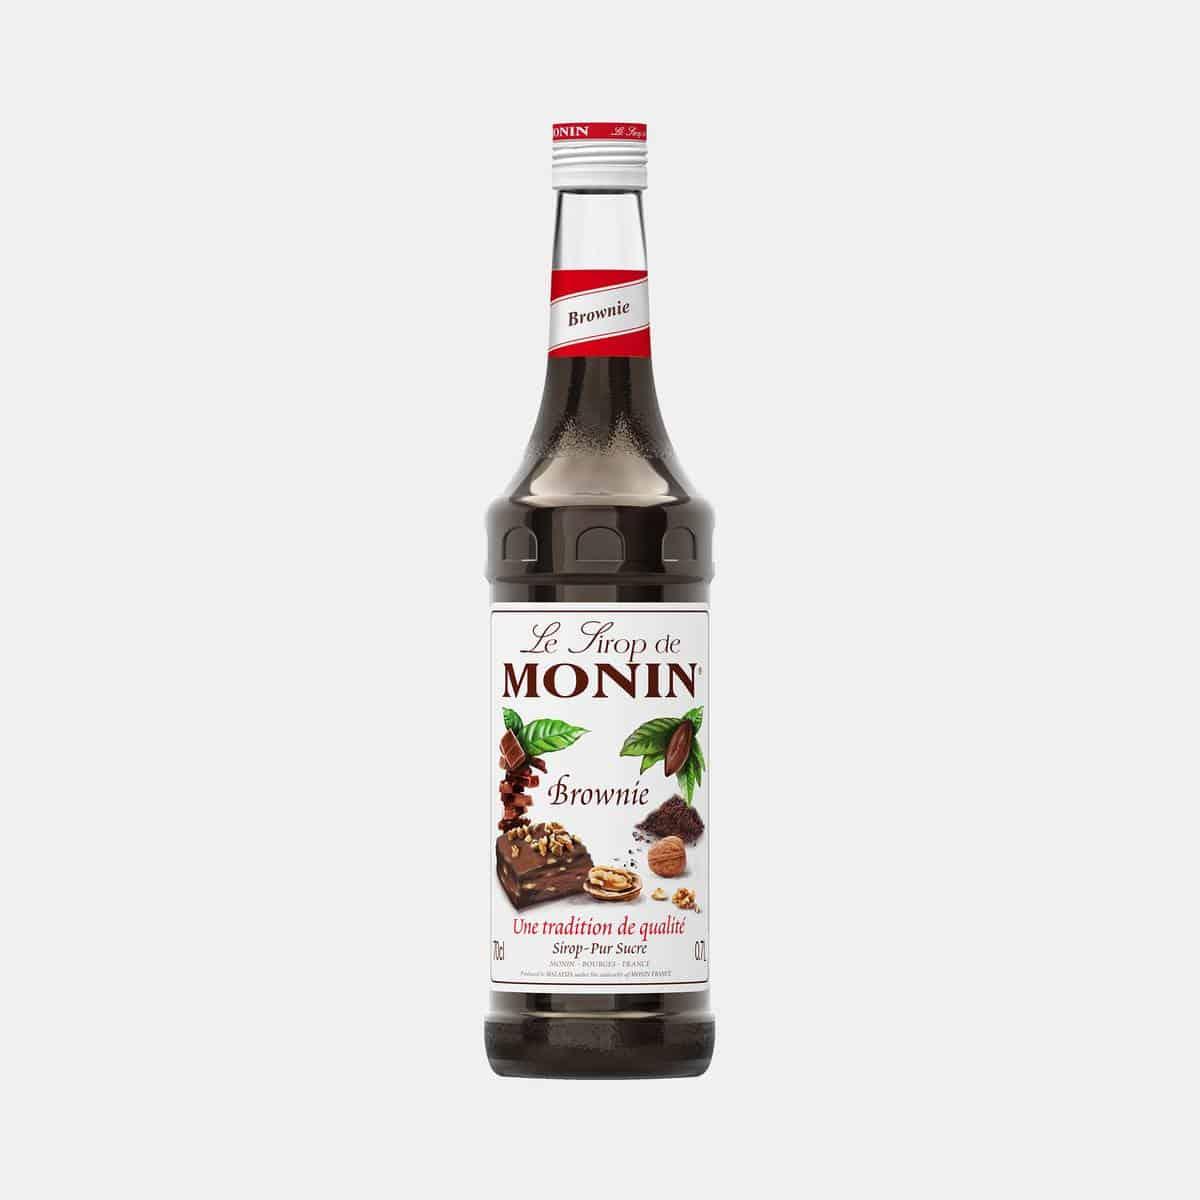 Monin Brownie Syrup 700ml Glass Bottle